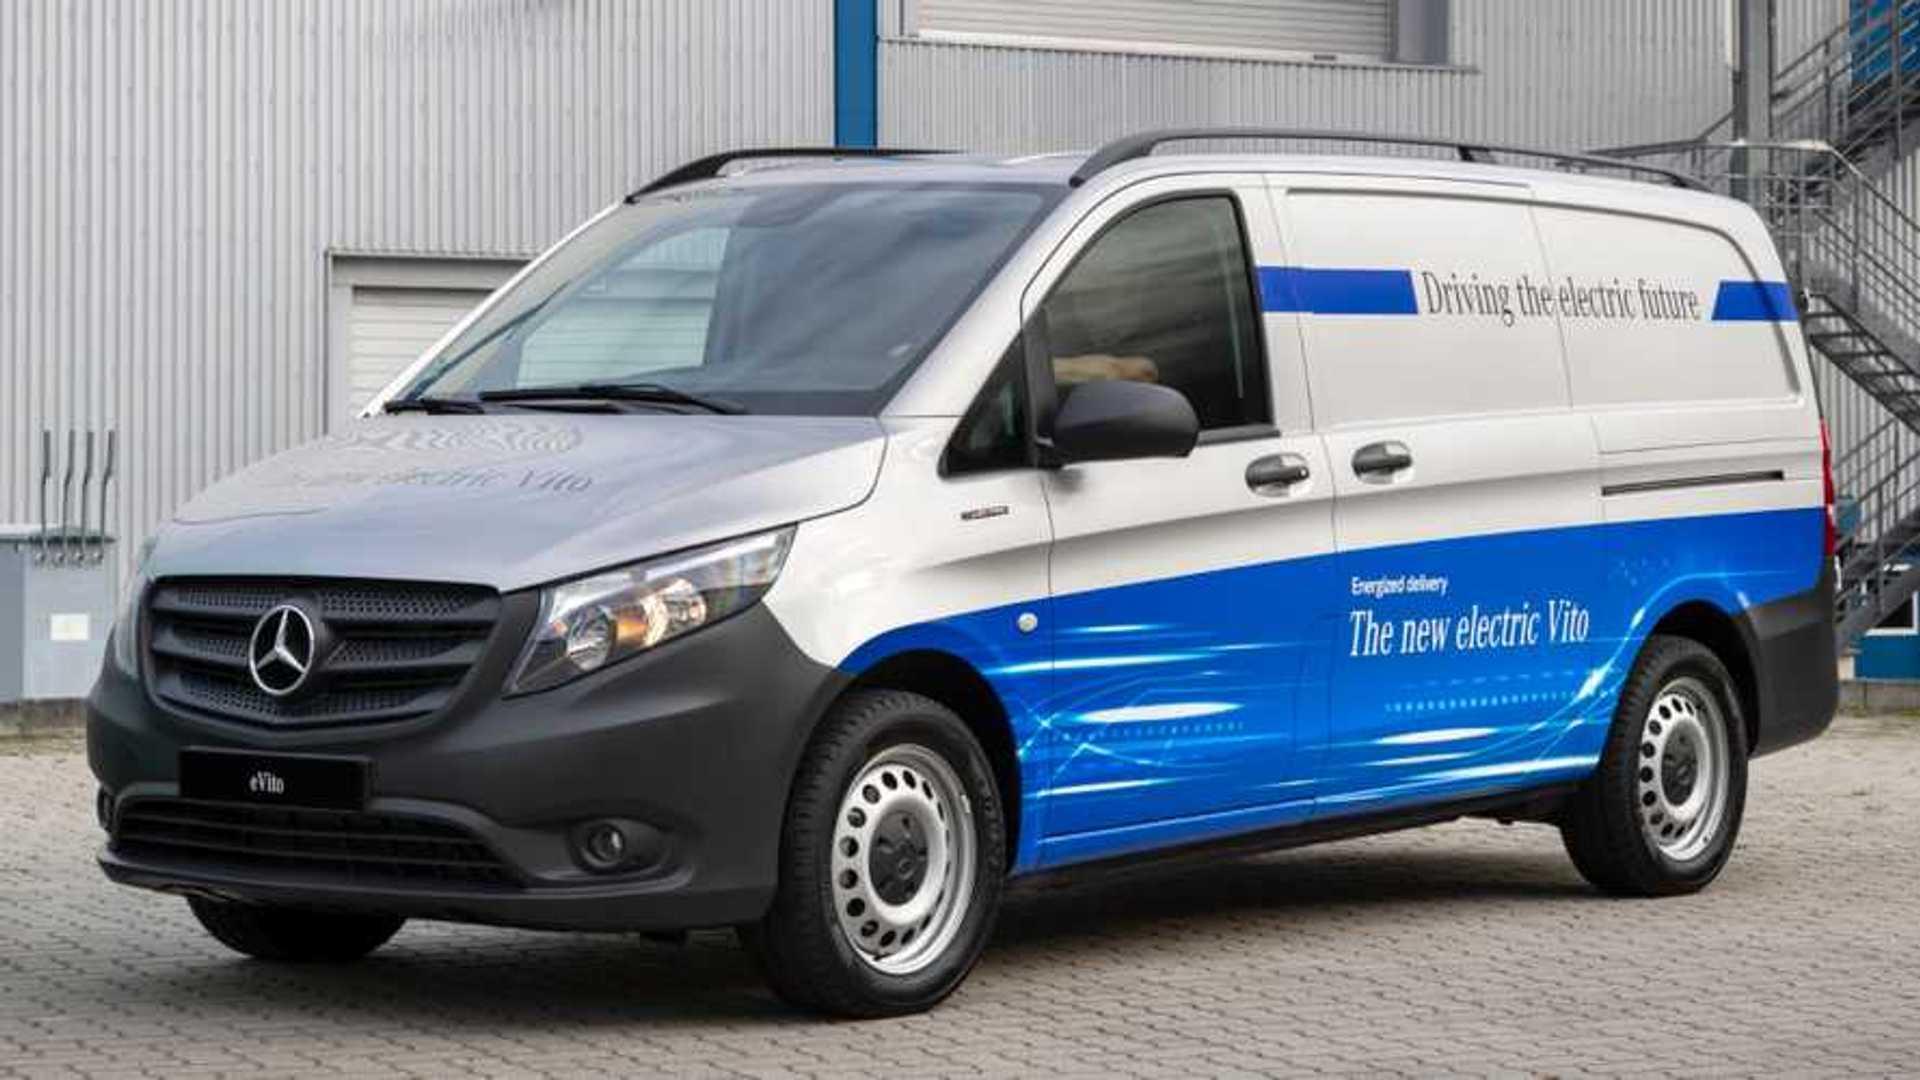 Mercedes' e-Vito electric van to cost almost £40,000 PLUS VAT